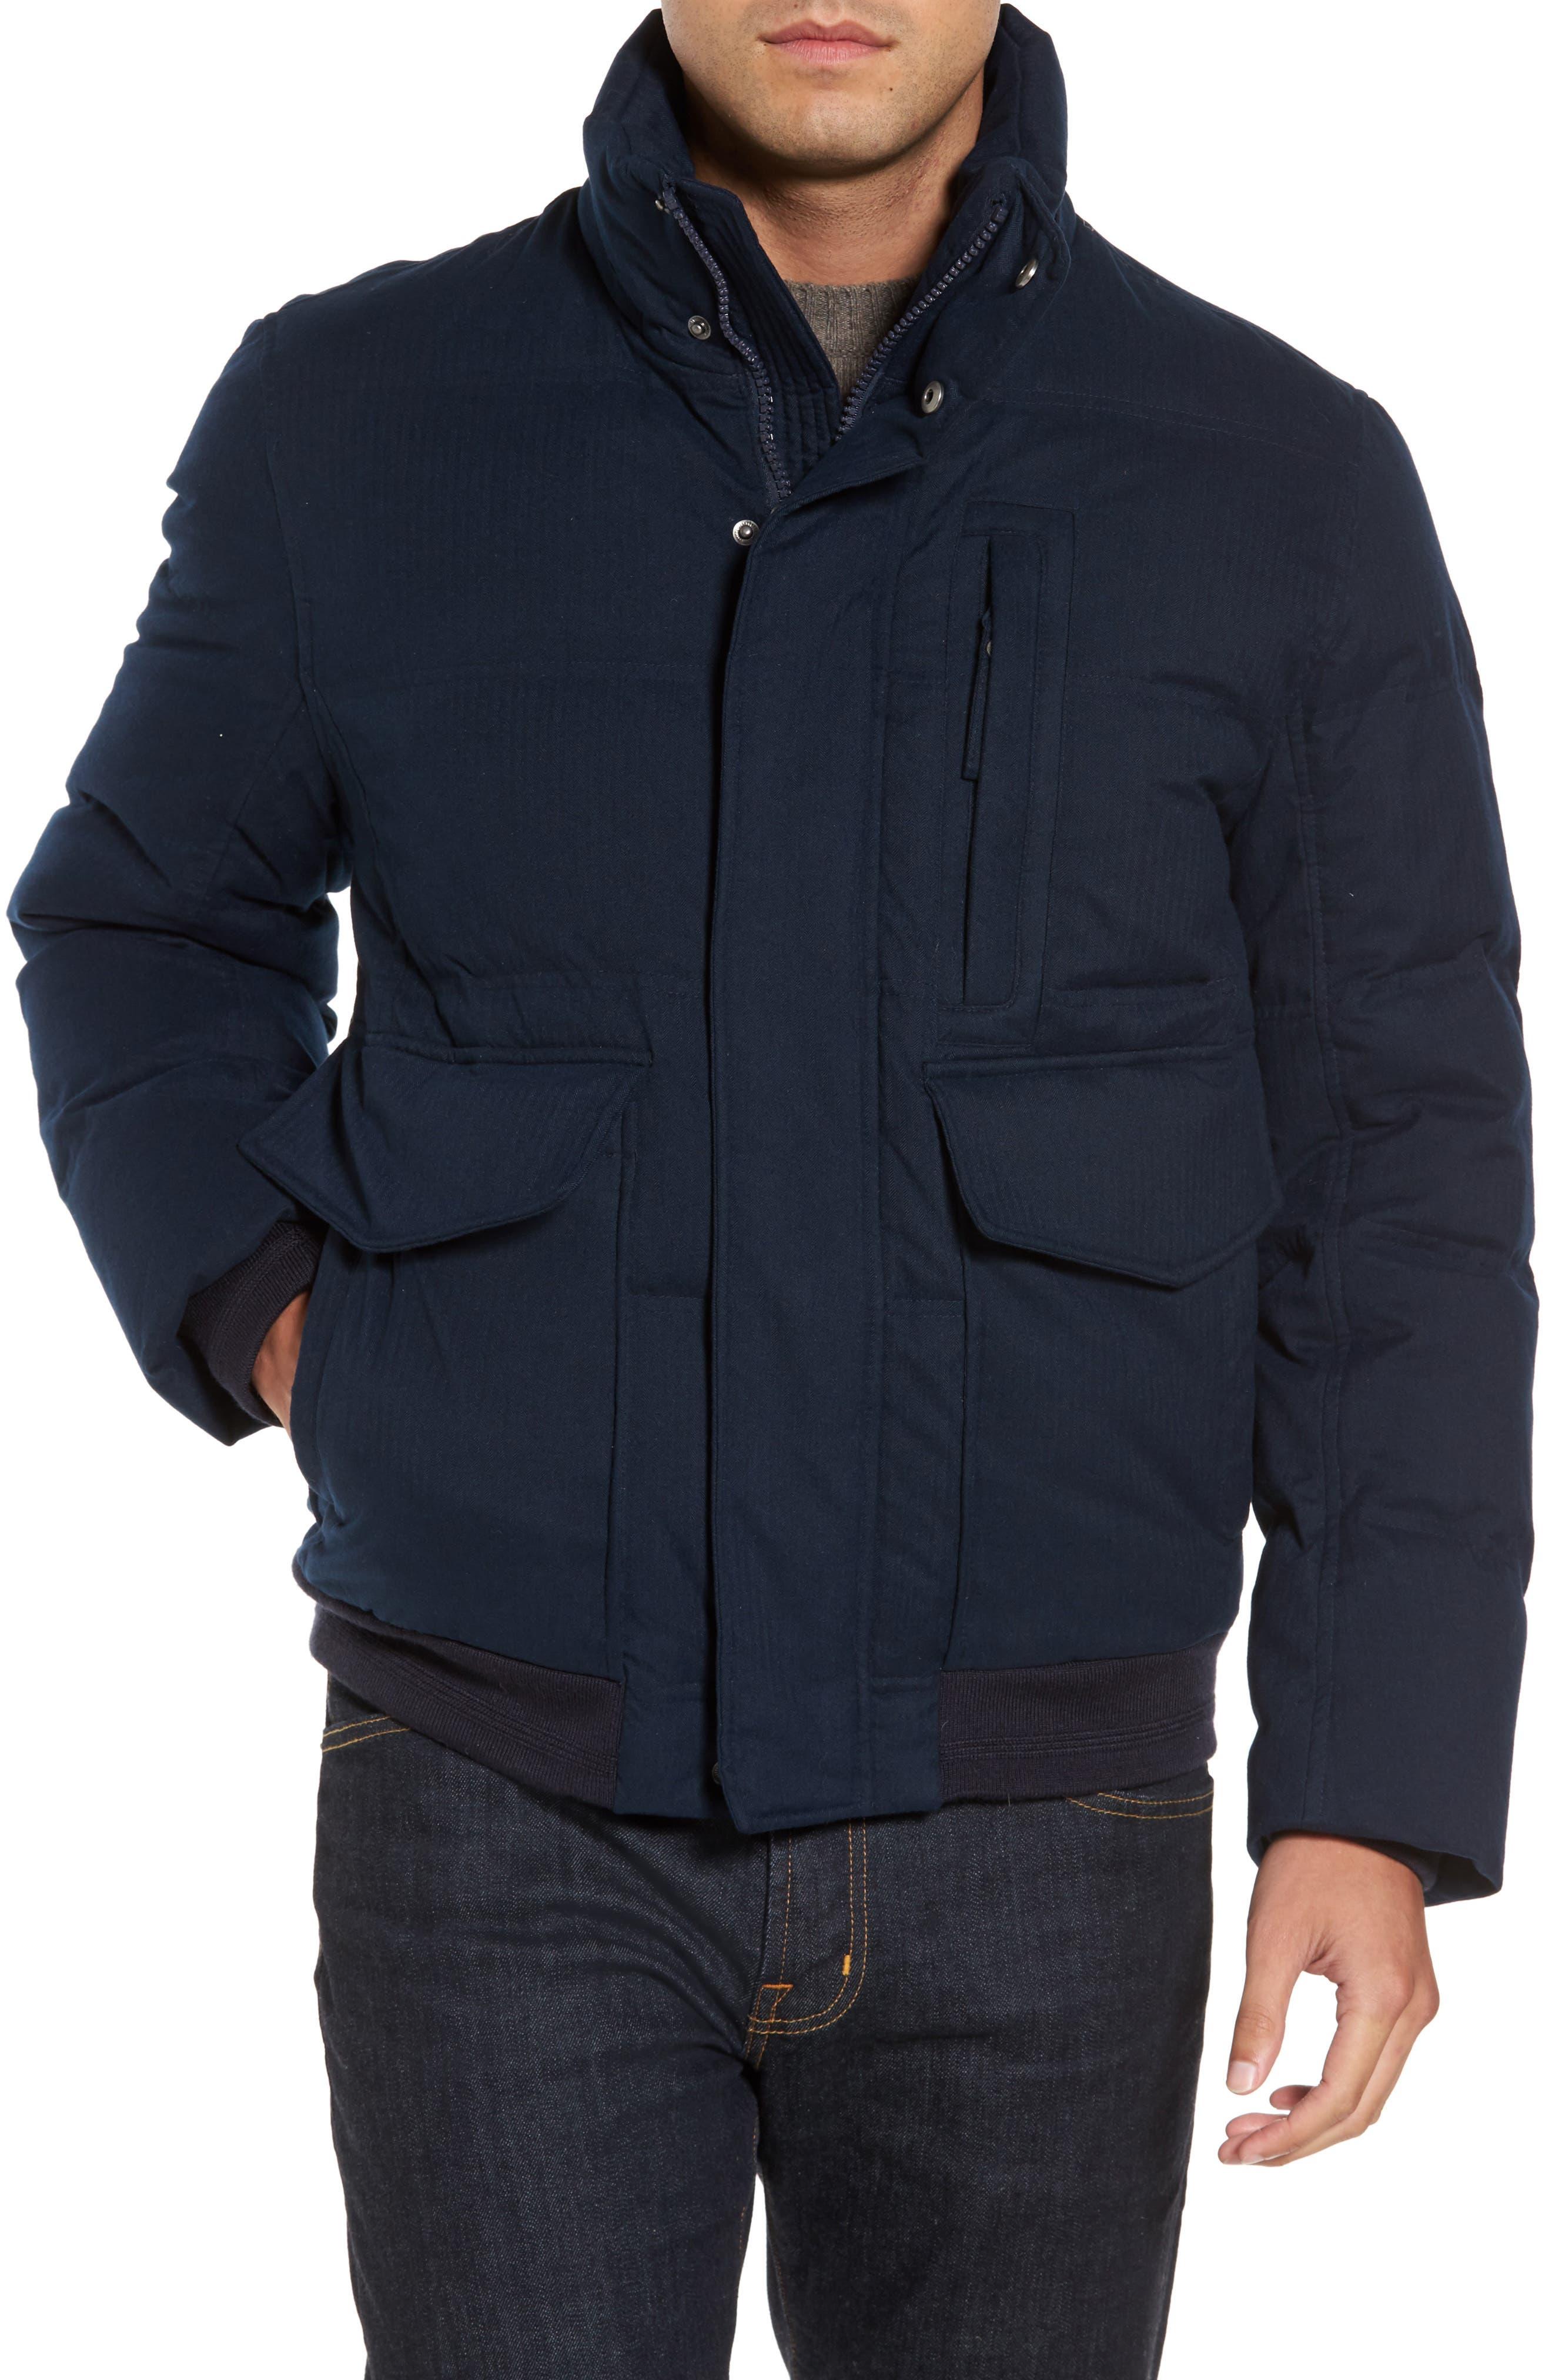 Alternate Image 4  - Marc New York Down Herringbone Jacket with Genuine Coyote Fur Trim